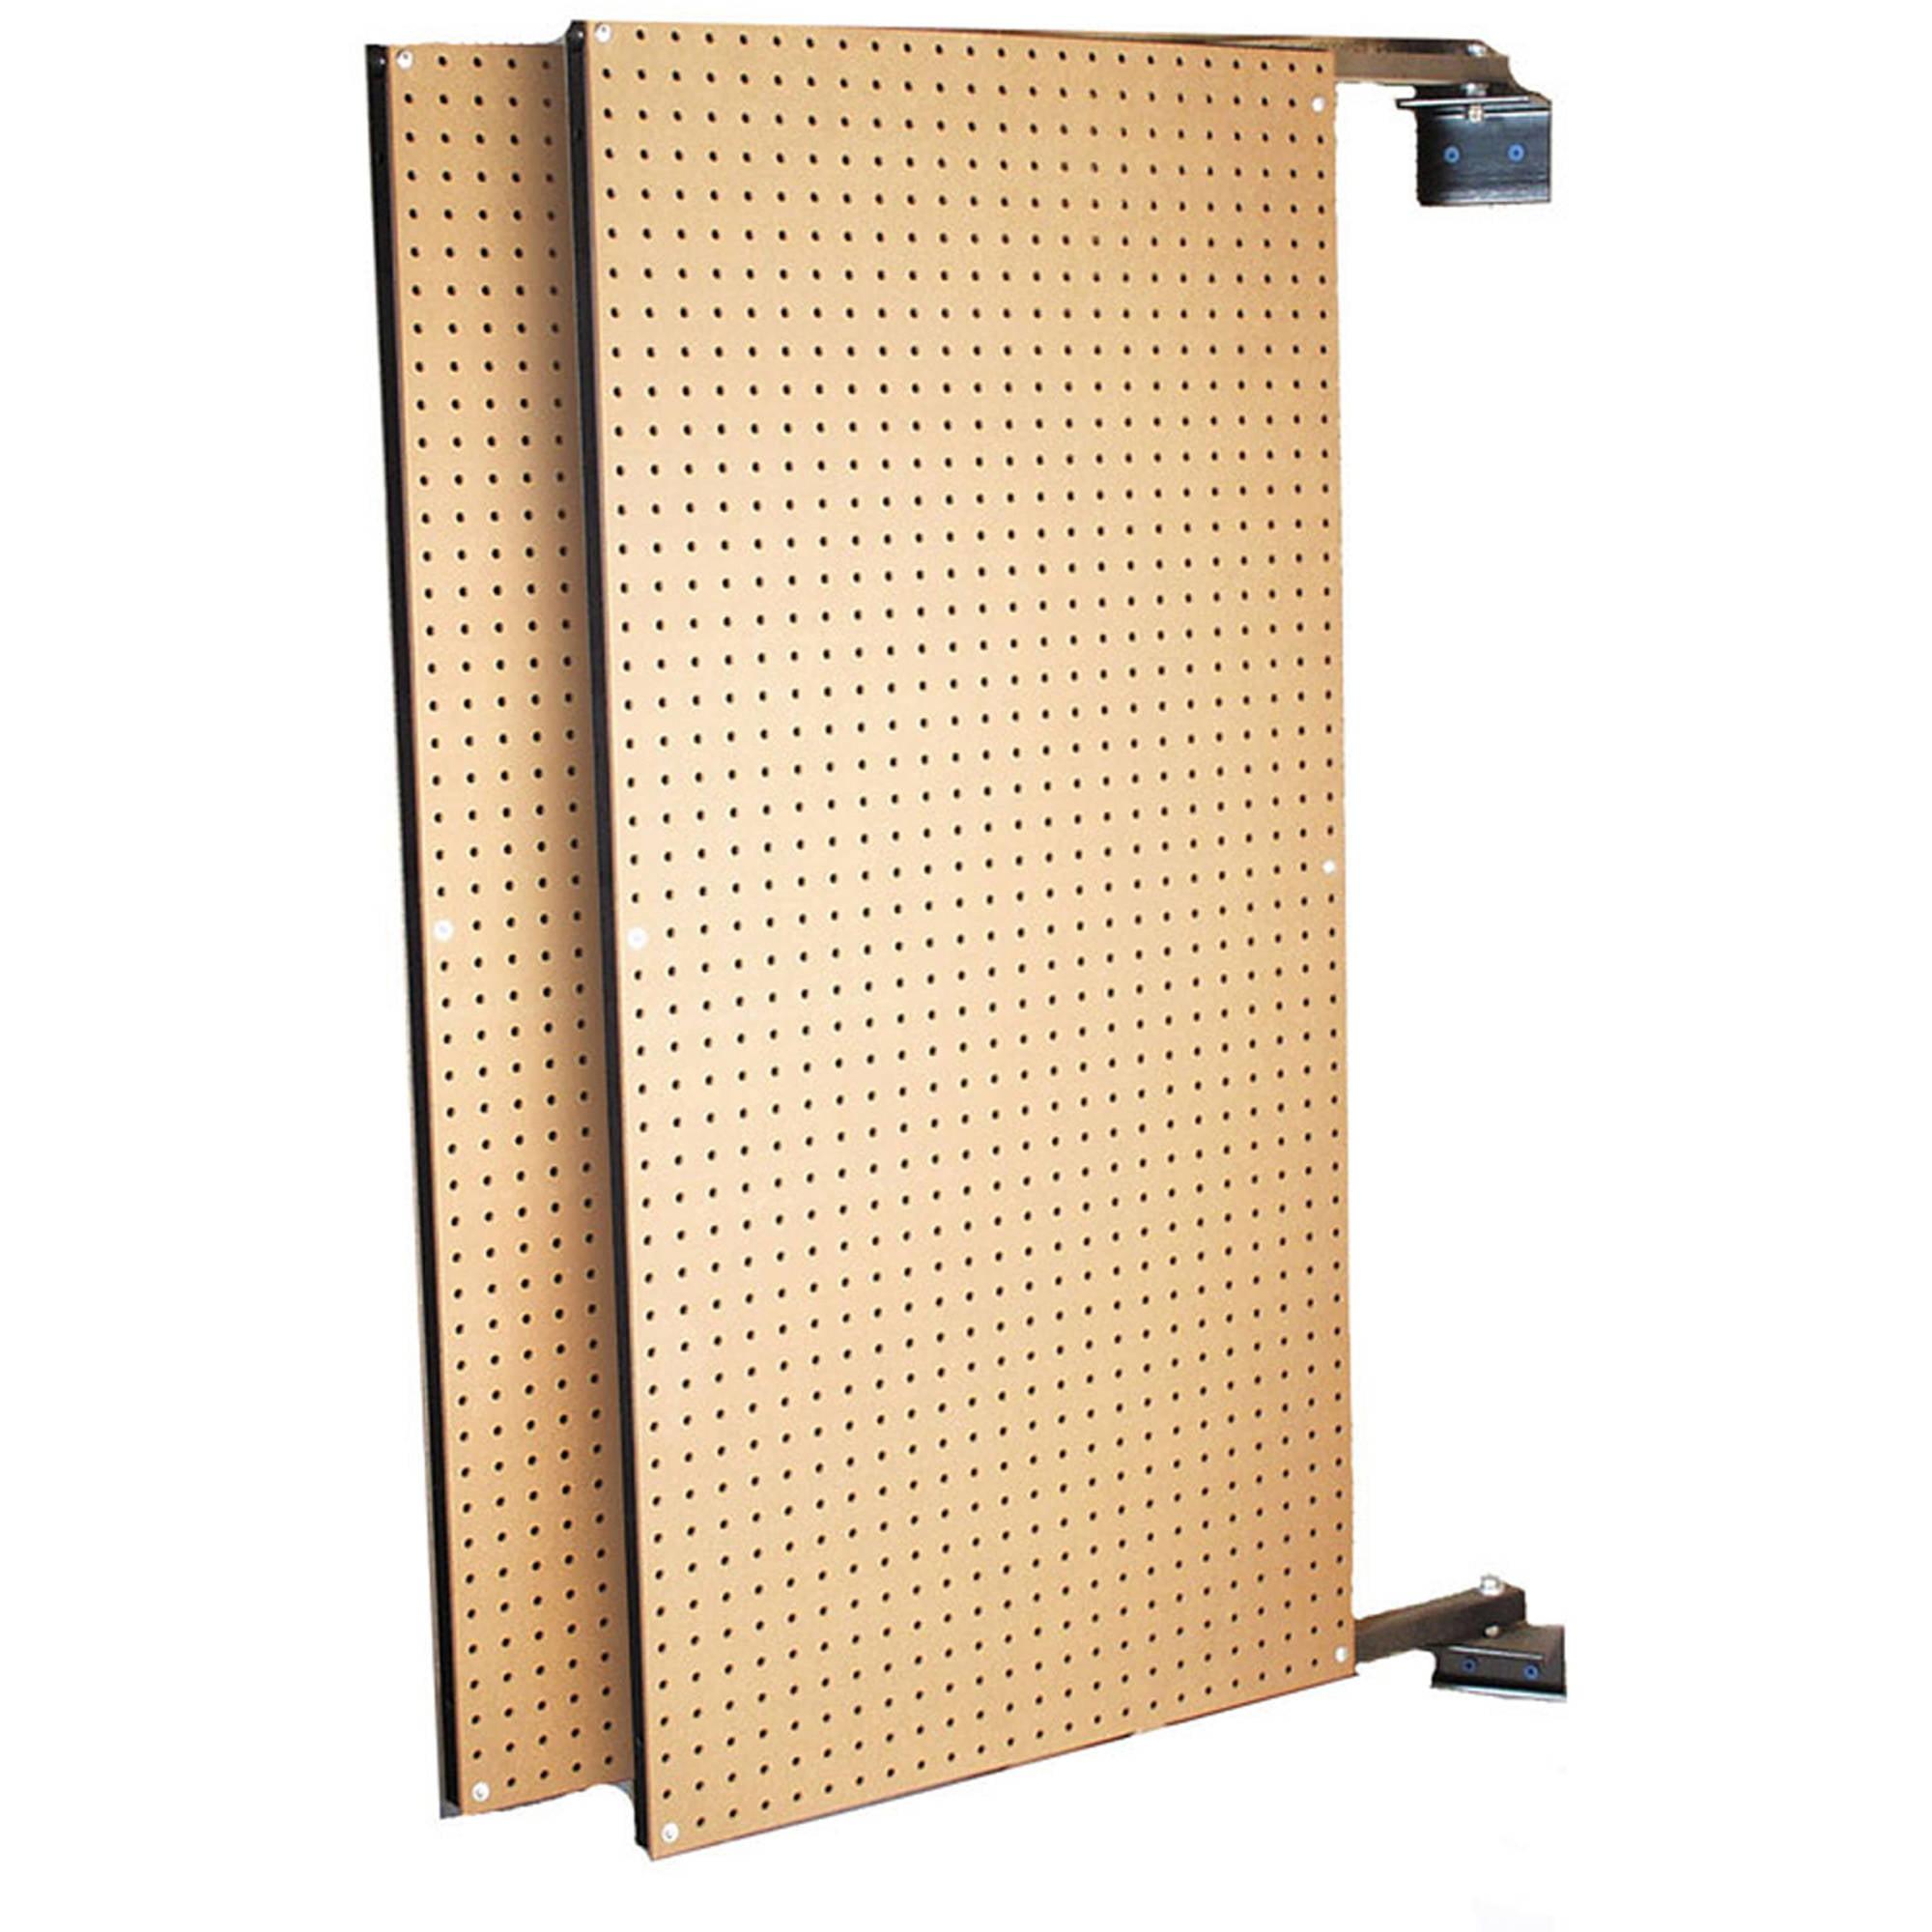 "XtraWall (2) 24""W x 48""H x 1-1/2""D Wall Mount Double-Sided Swing-Panel Pegboard"